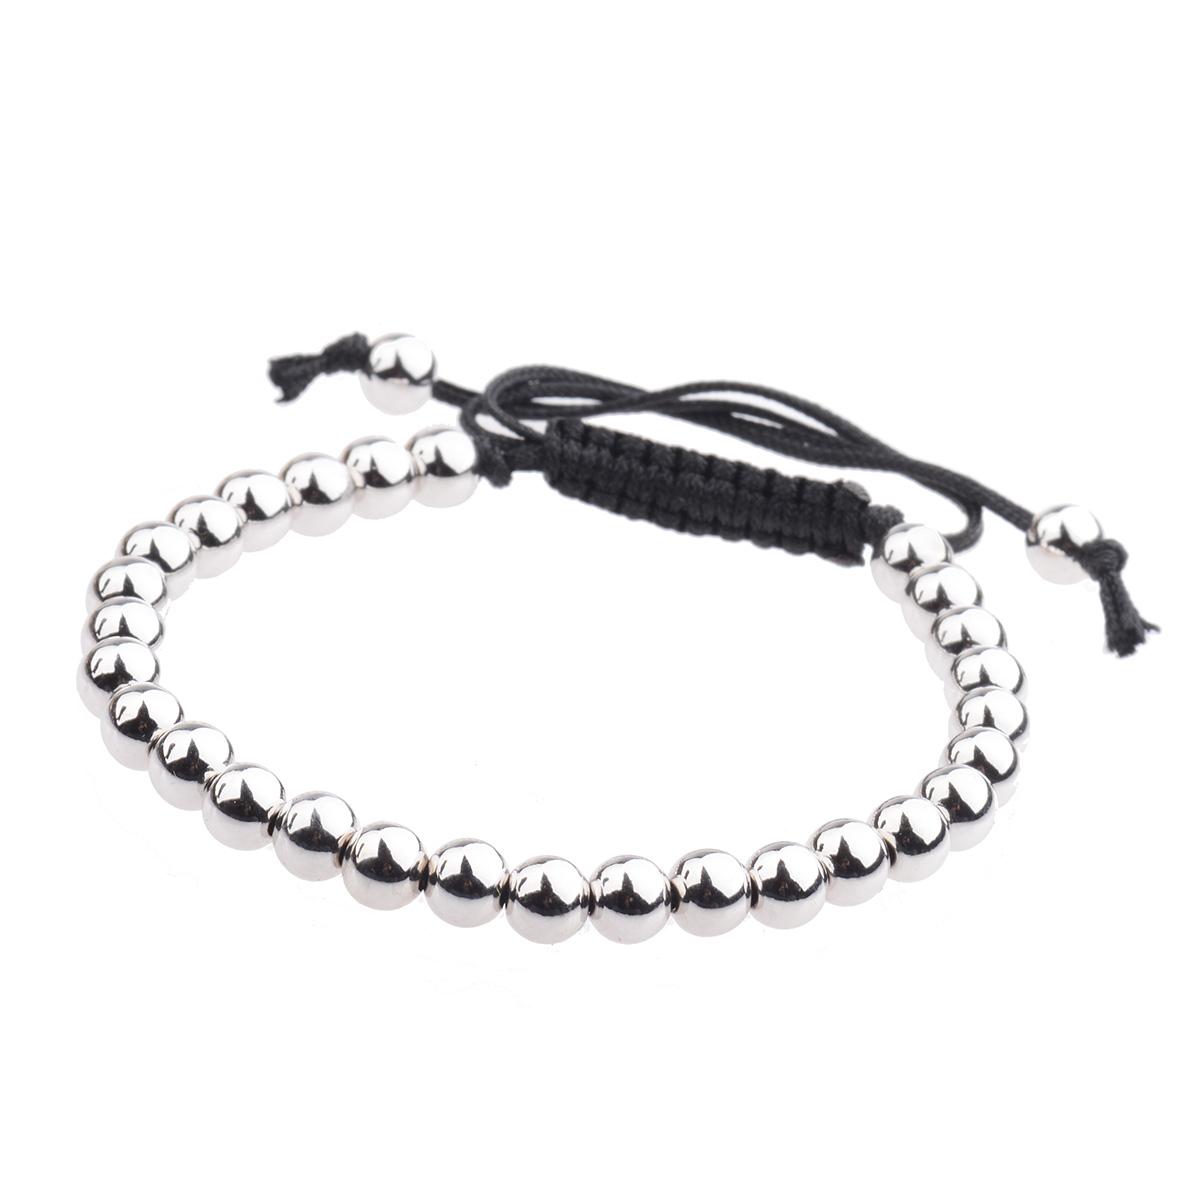 Fashion-Mens-Bracelet-24kt-Gold-Plated-Micro-Pave-Zircon-Macrame-Bracelets-6MM thumbnail 14